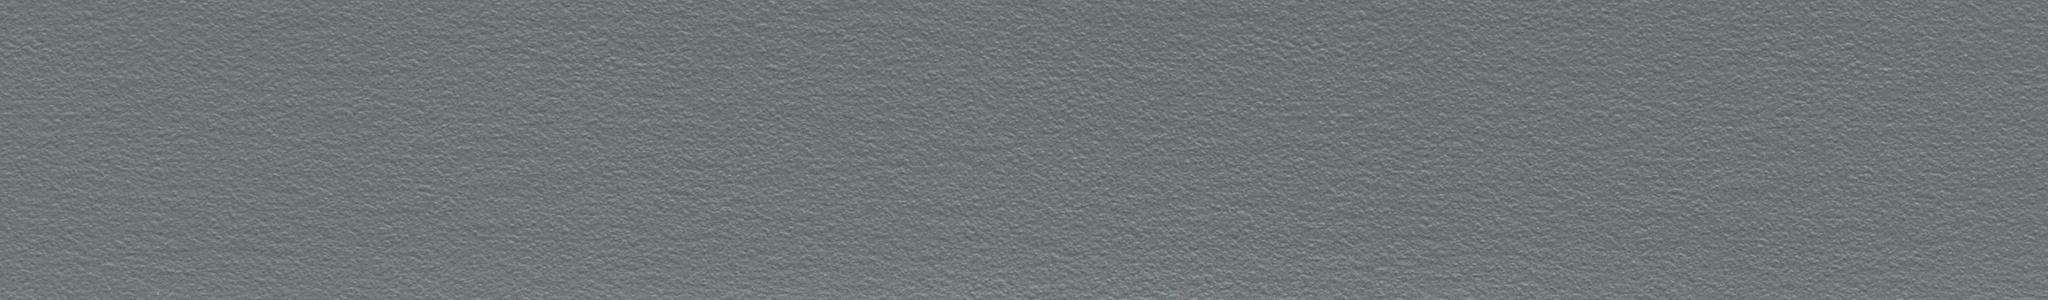 HU 166737 ABS Edge Green Soft Pearl 107